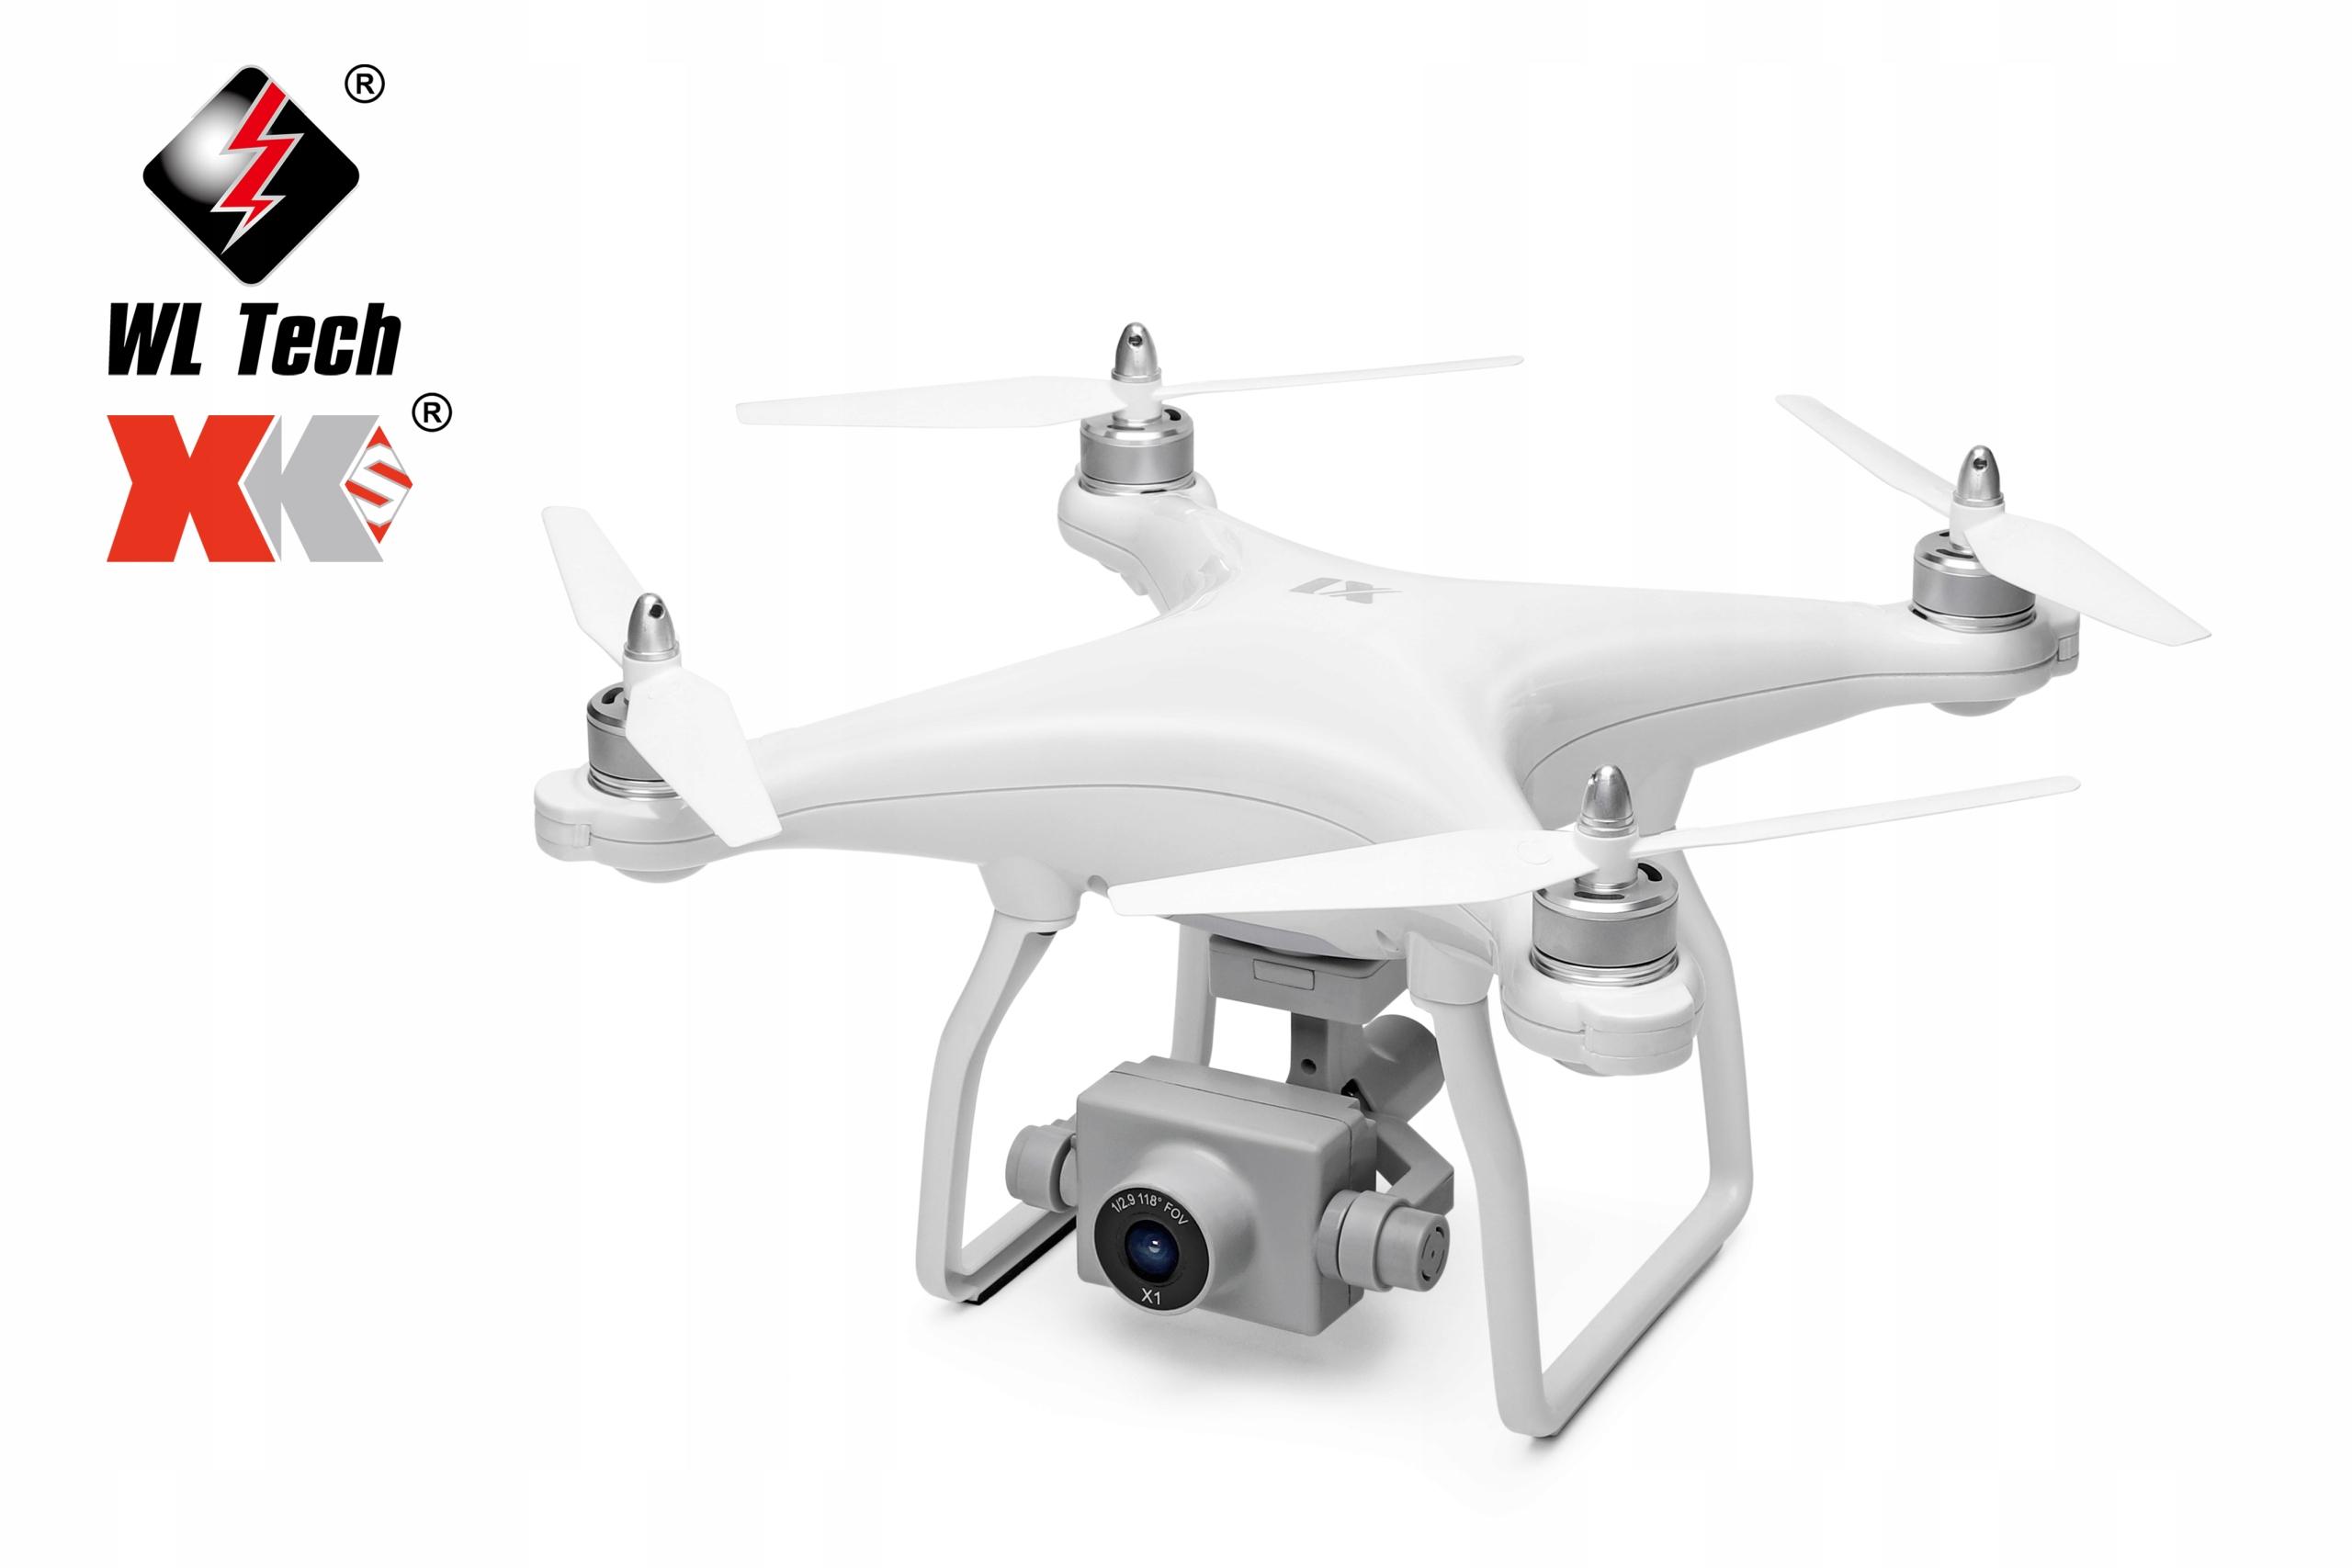 DRONE QUADROCOPTER X1 1080p LIVE GPS VIEW